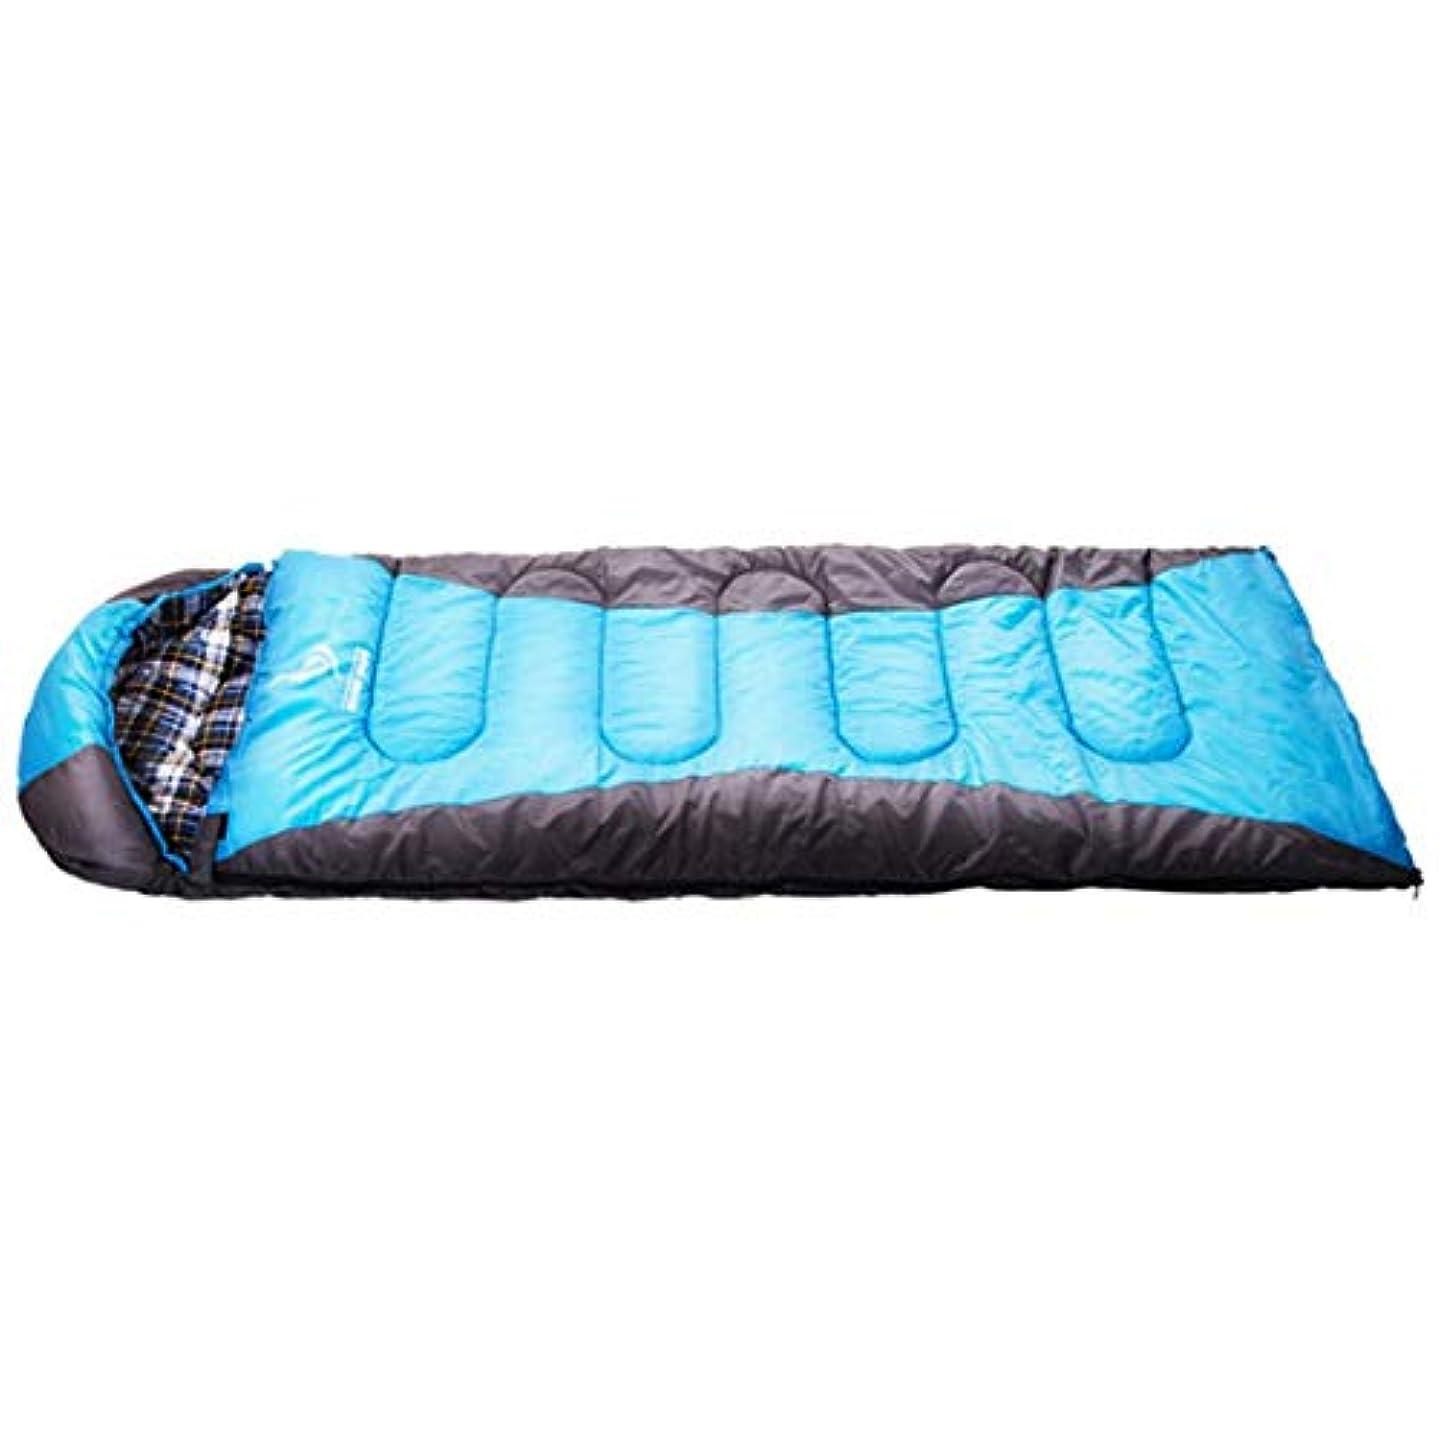 独占失速自己ノウ建材貿易 屋外多機能と便利な寝袋 (色 : 青)